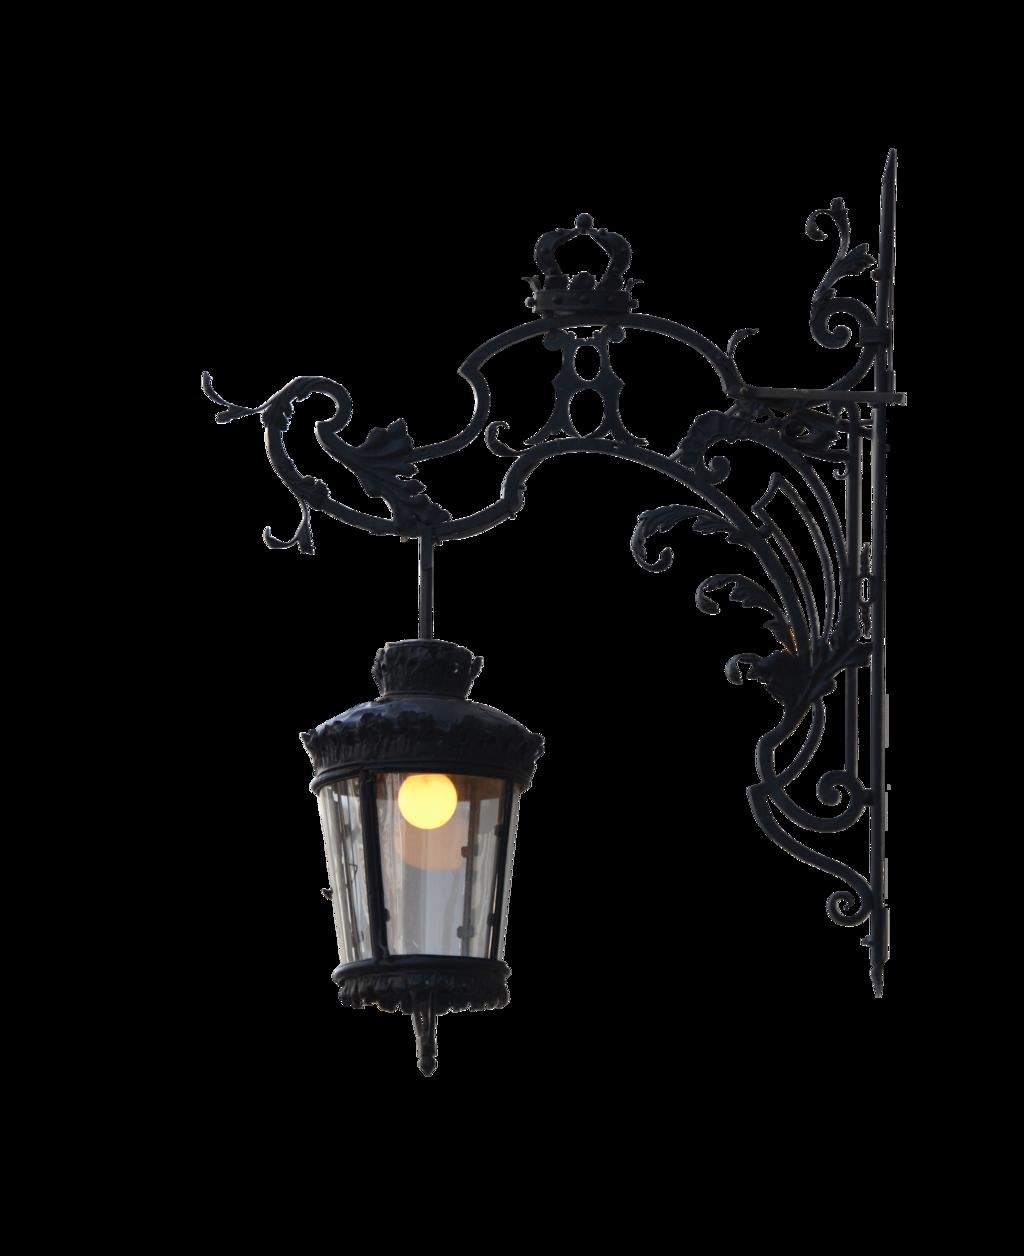 Lamp clipart railroad lantern. Png file ip pinterest